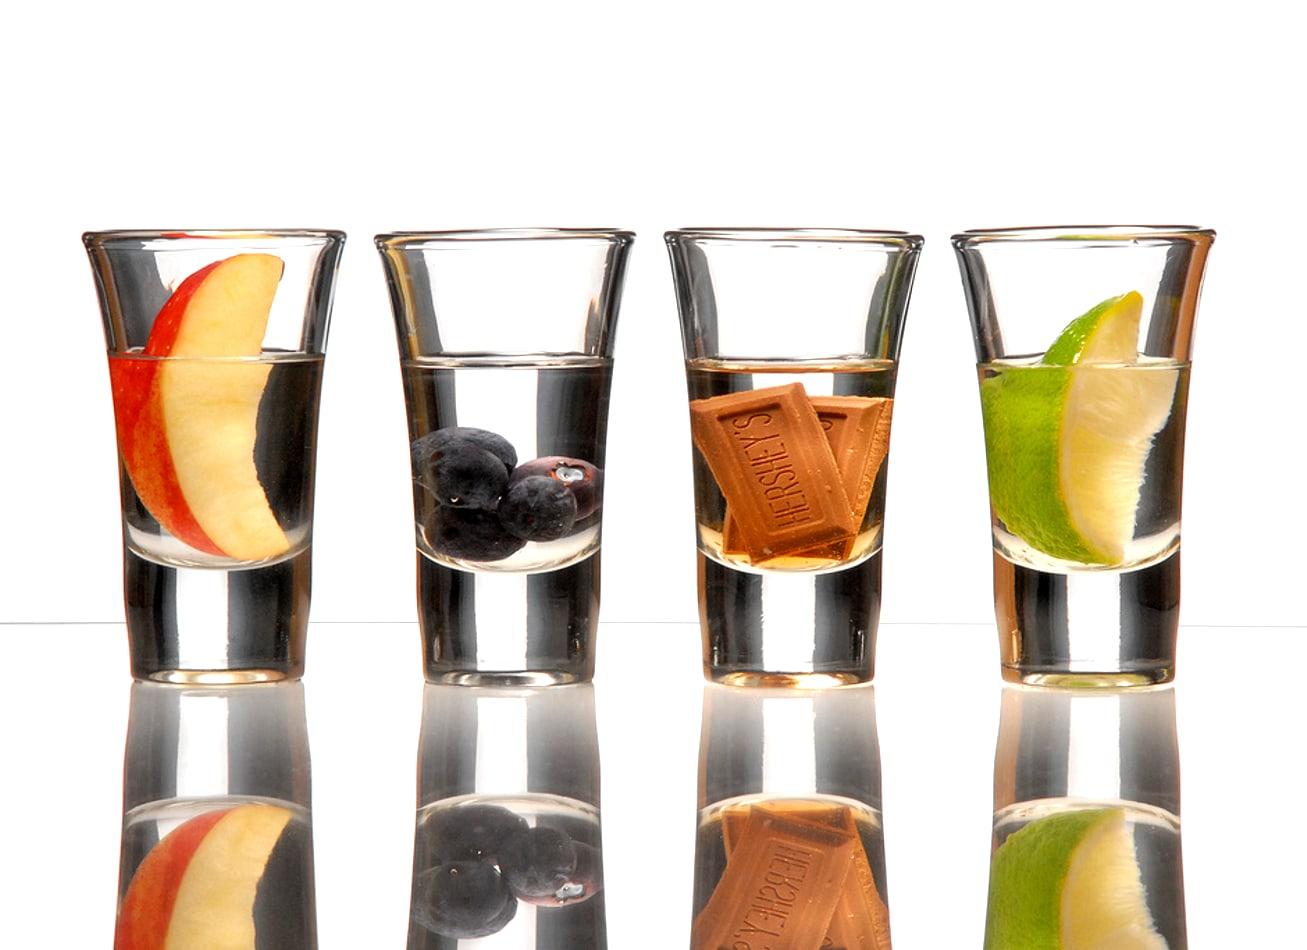 dégustation de vodka varsovie activites vimigo